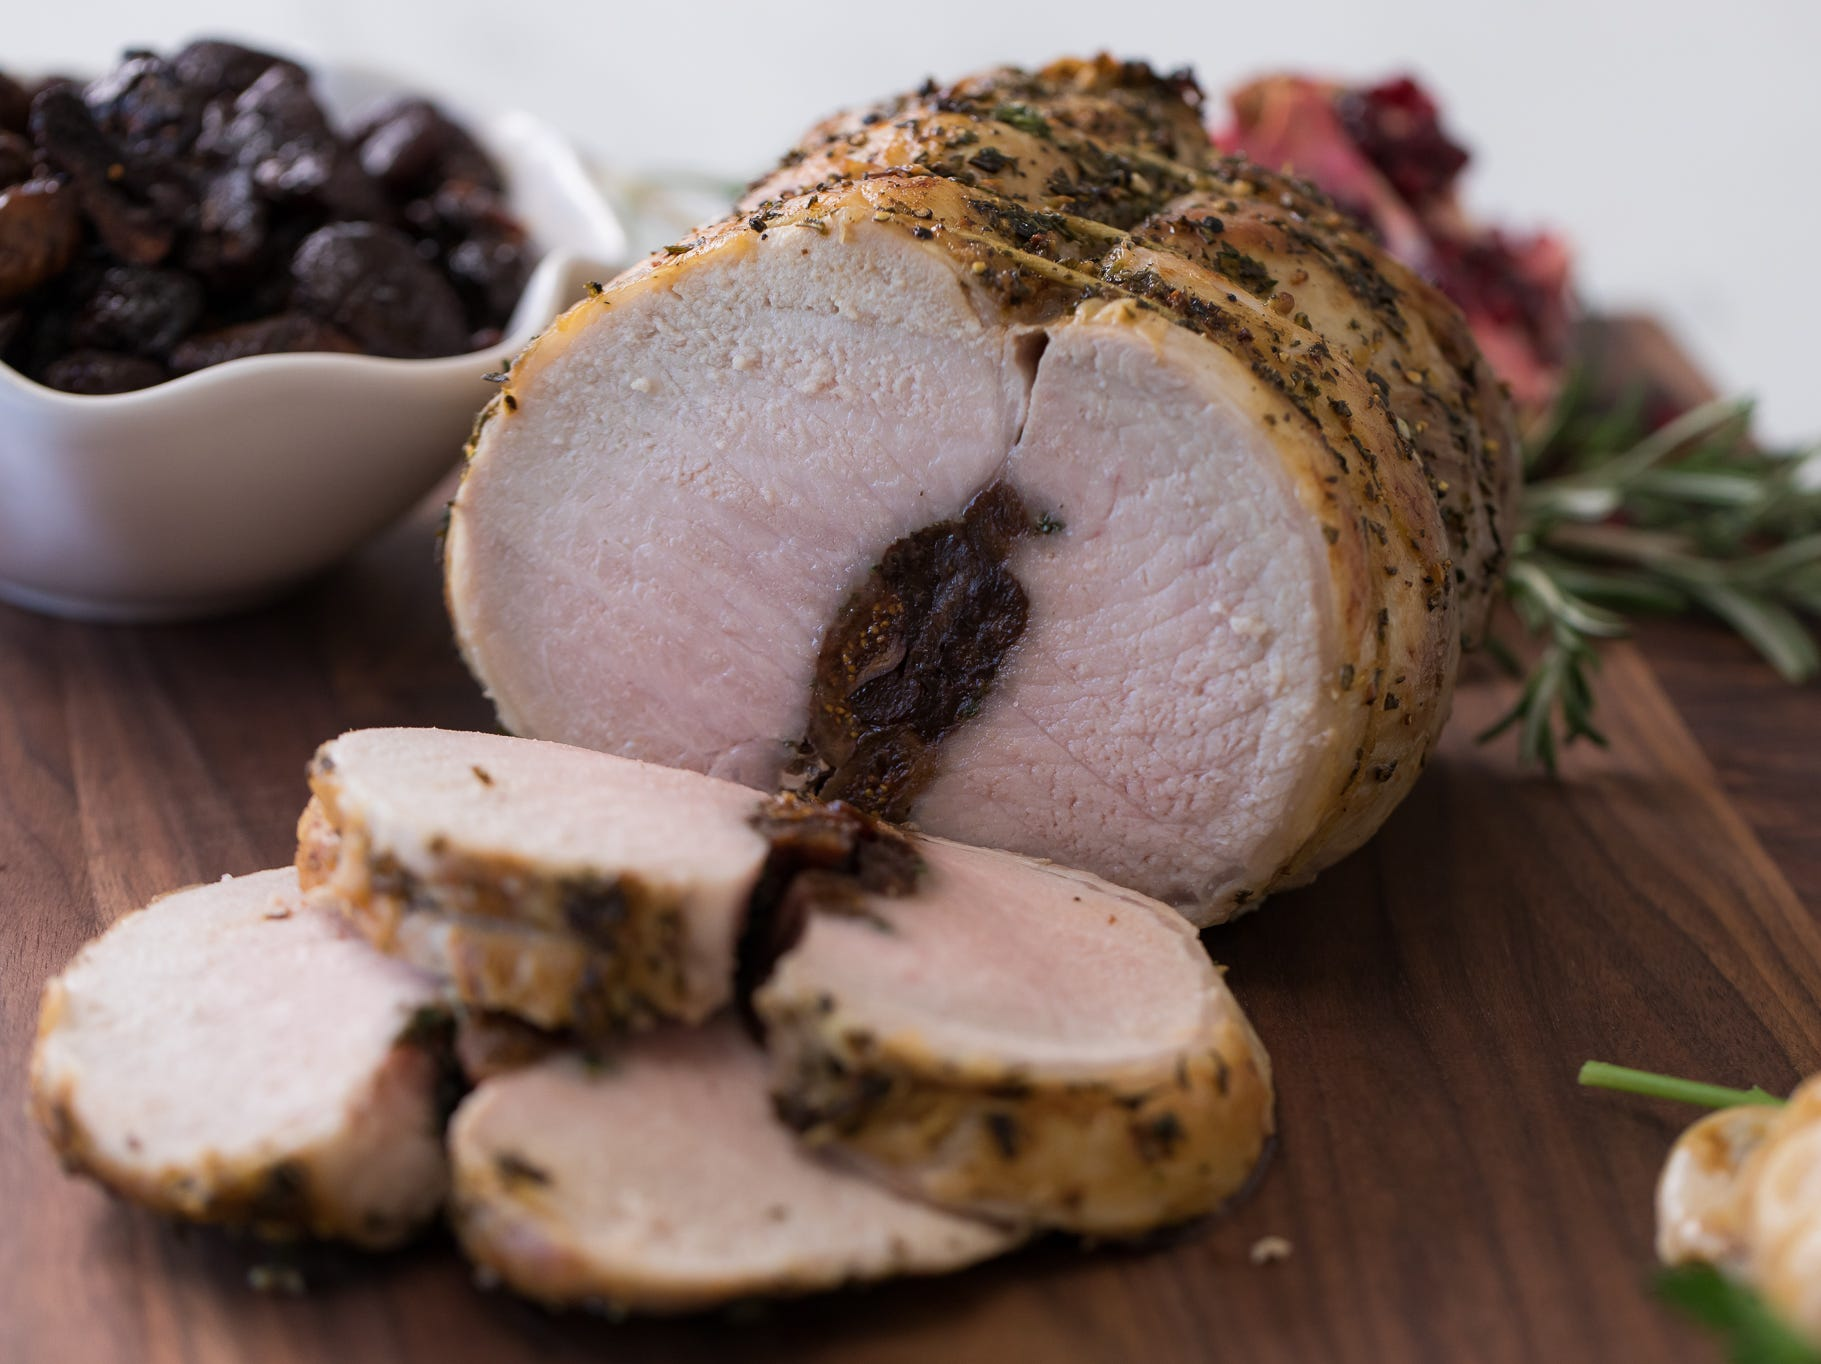 Roast pork tenderloin with dried fruits